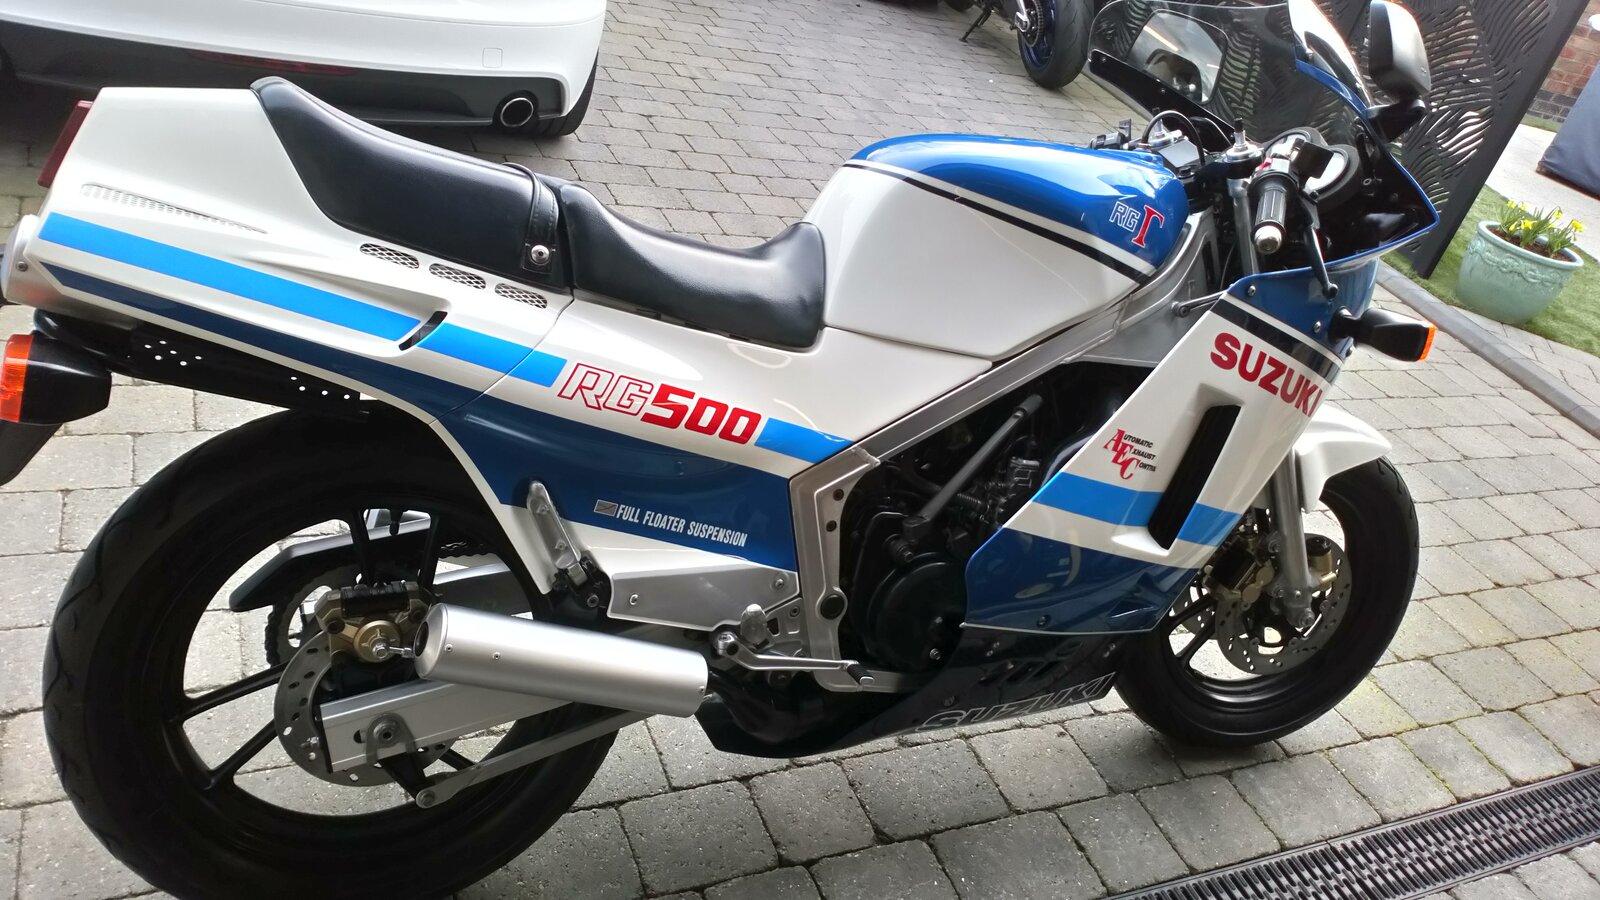 DSC_8604.JPG